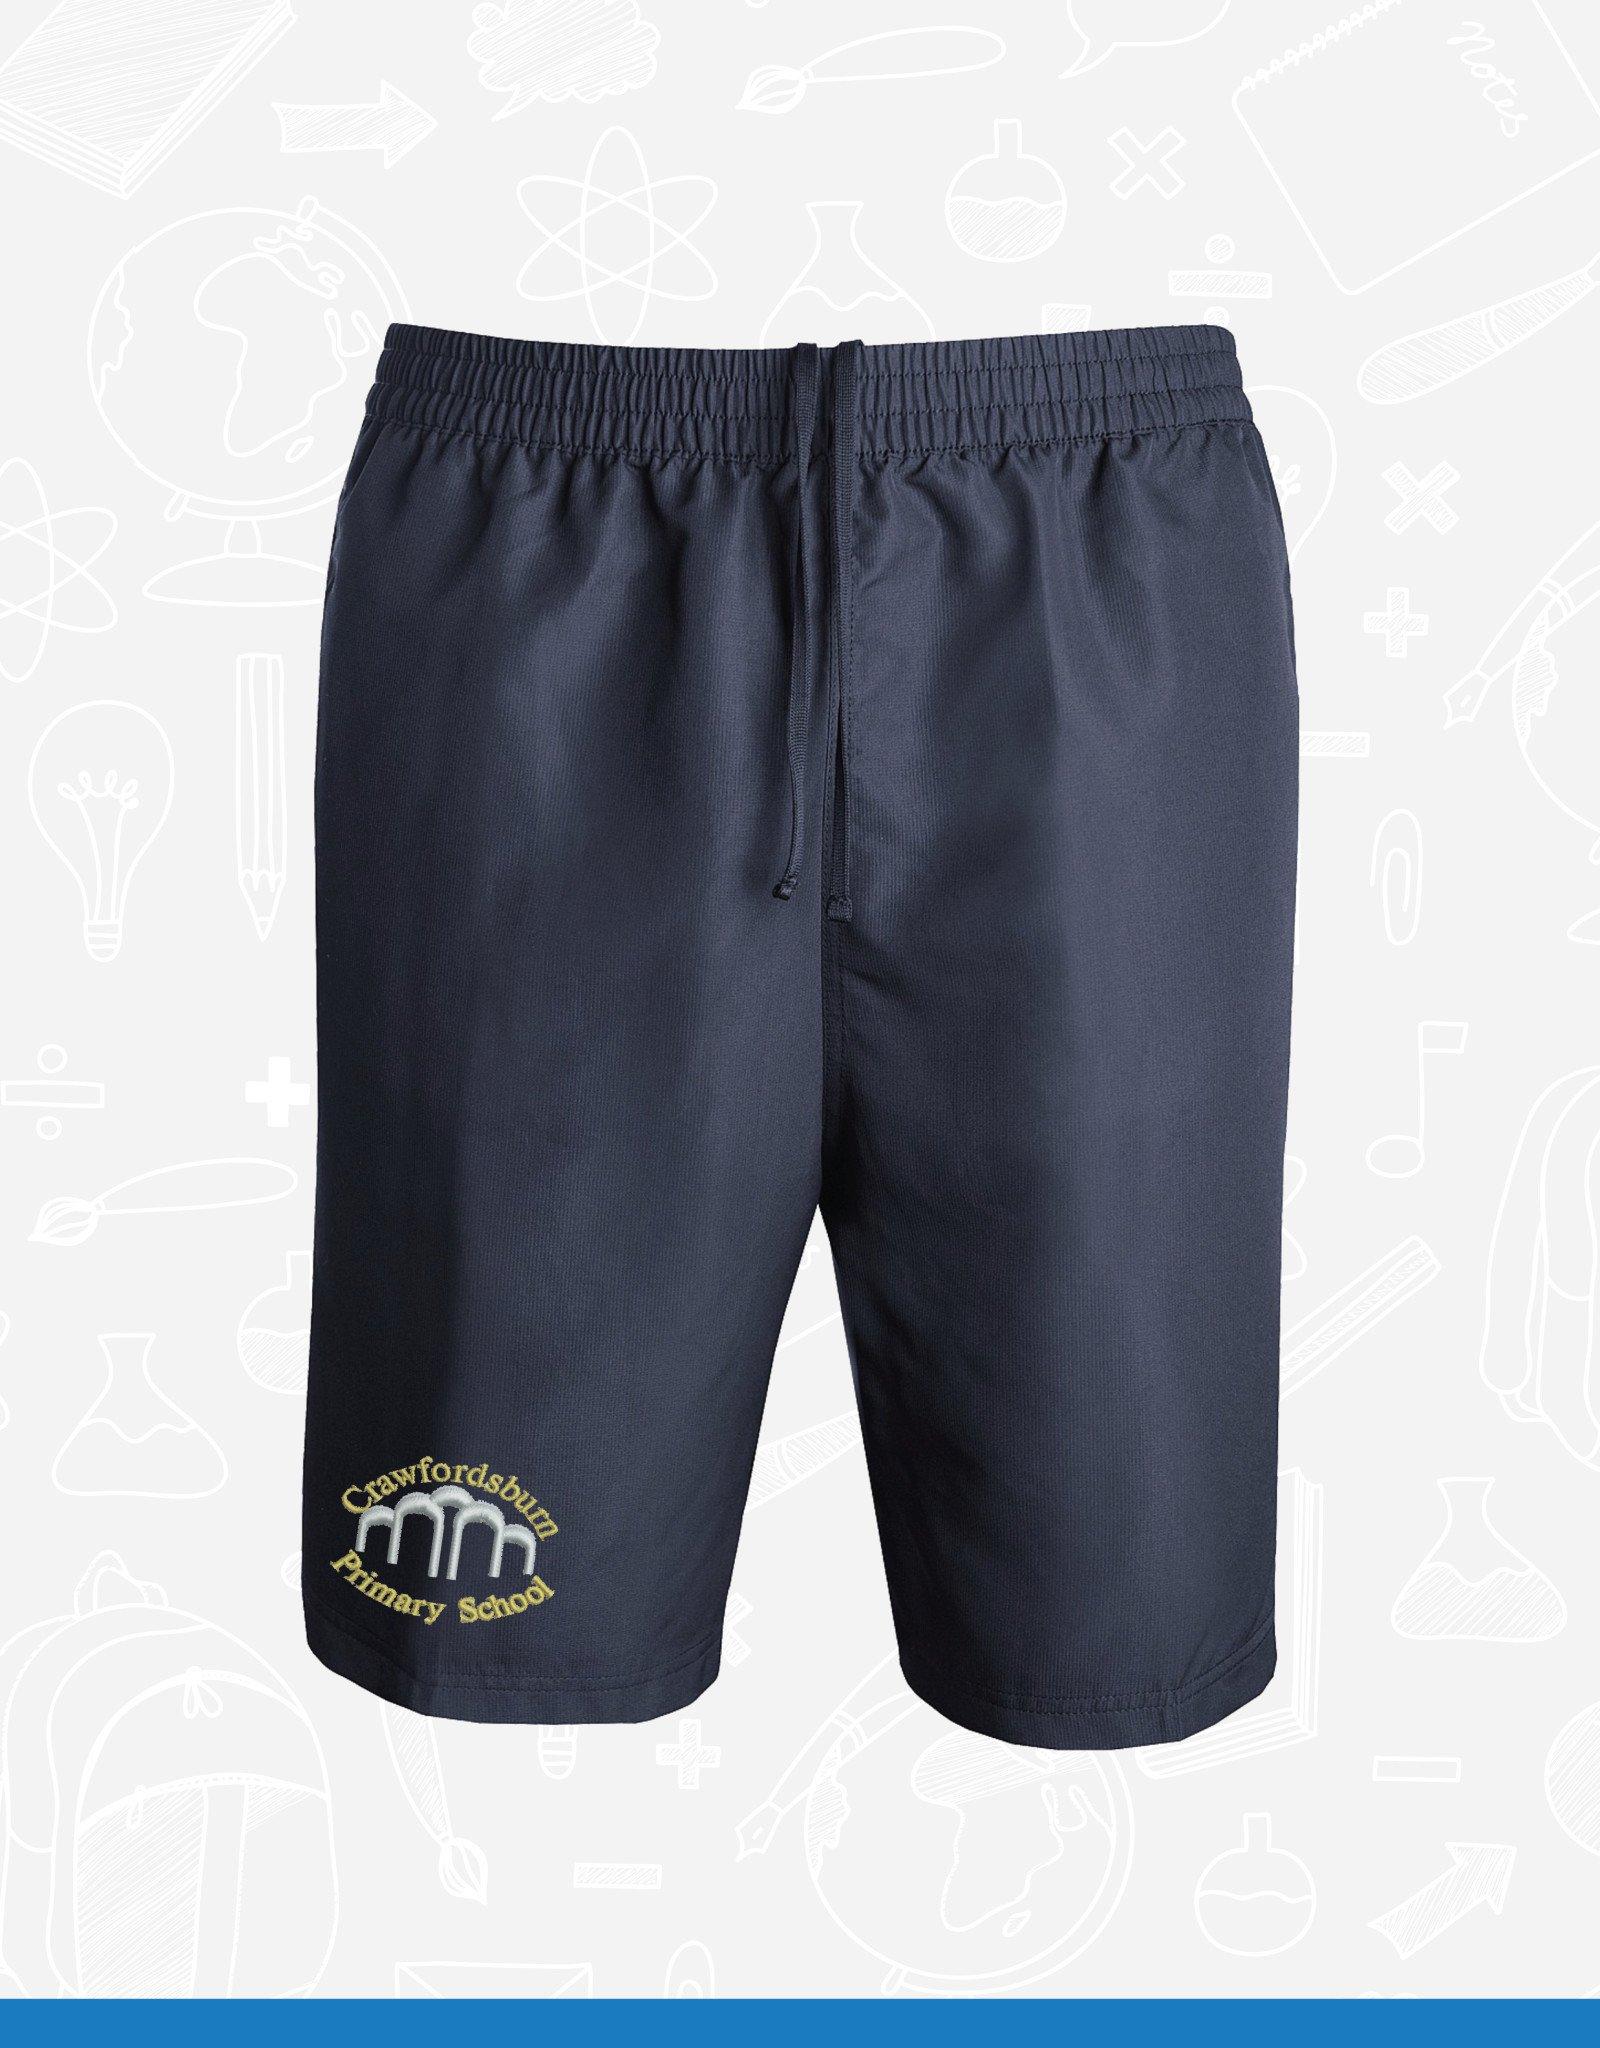 Aptus Crawfordsburn PE Shorts (111886)